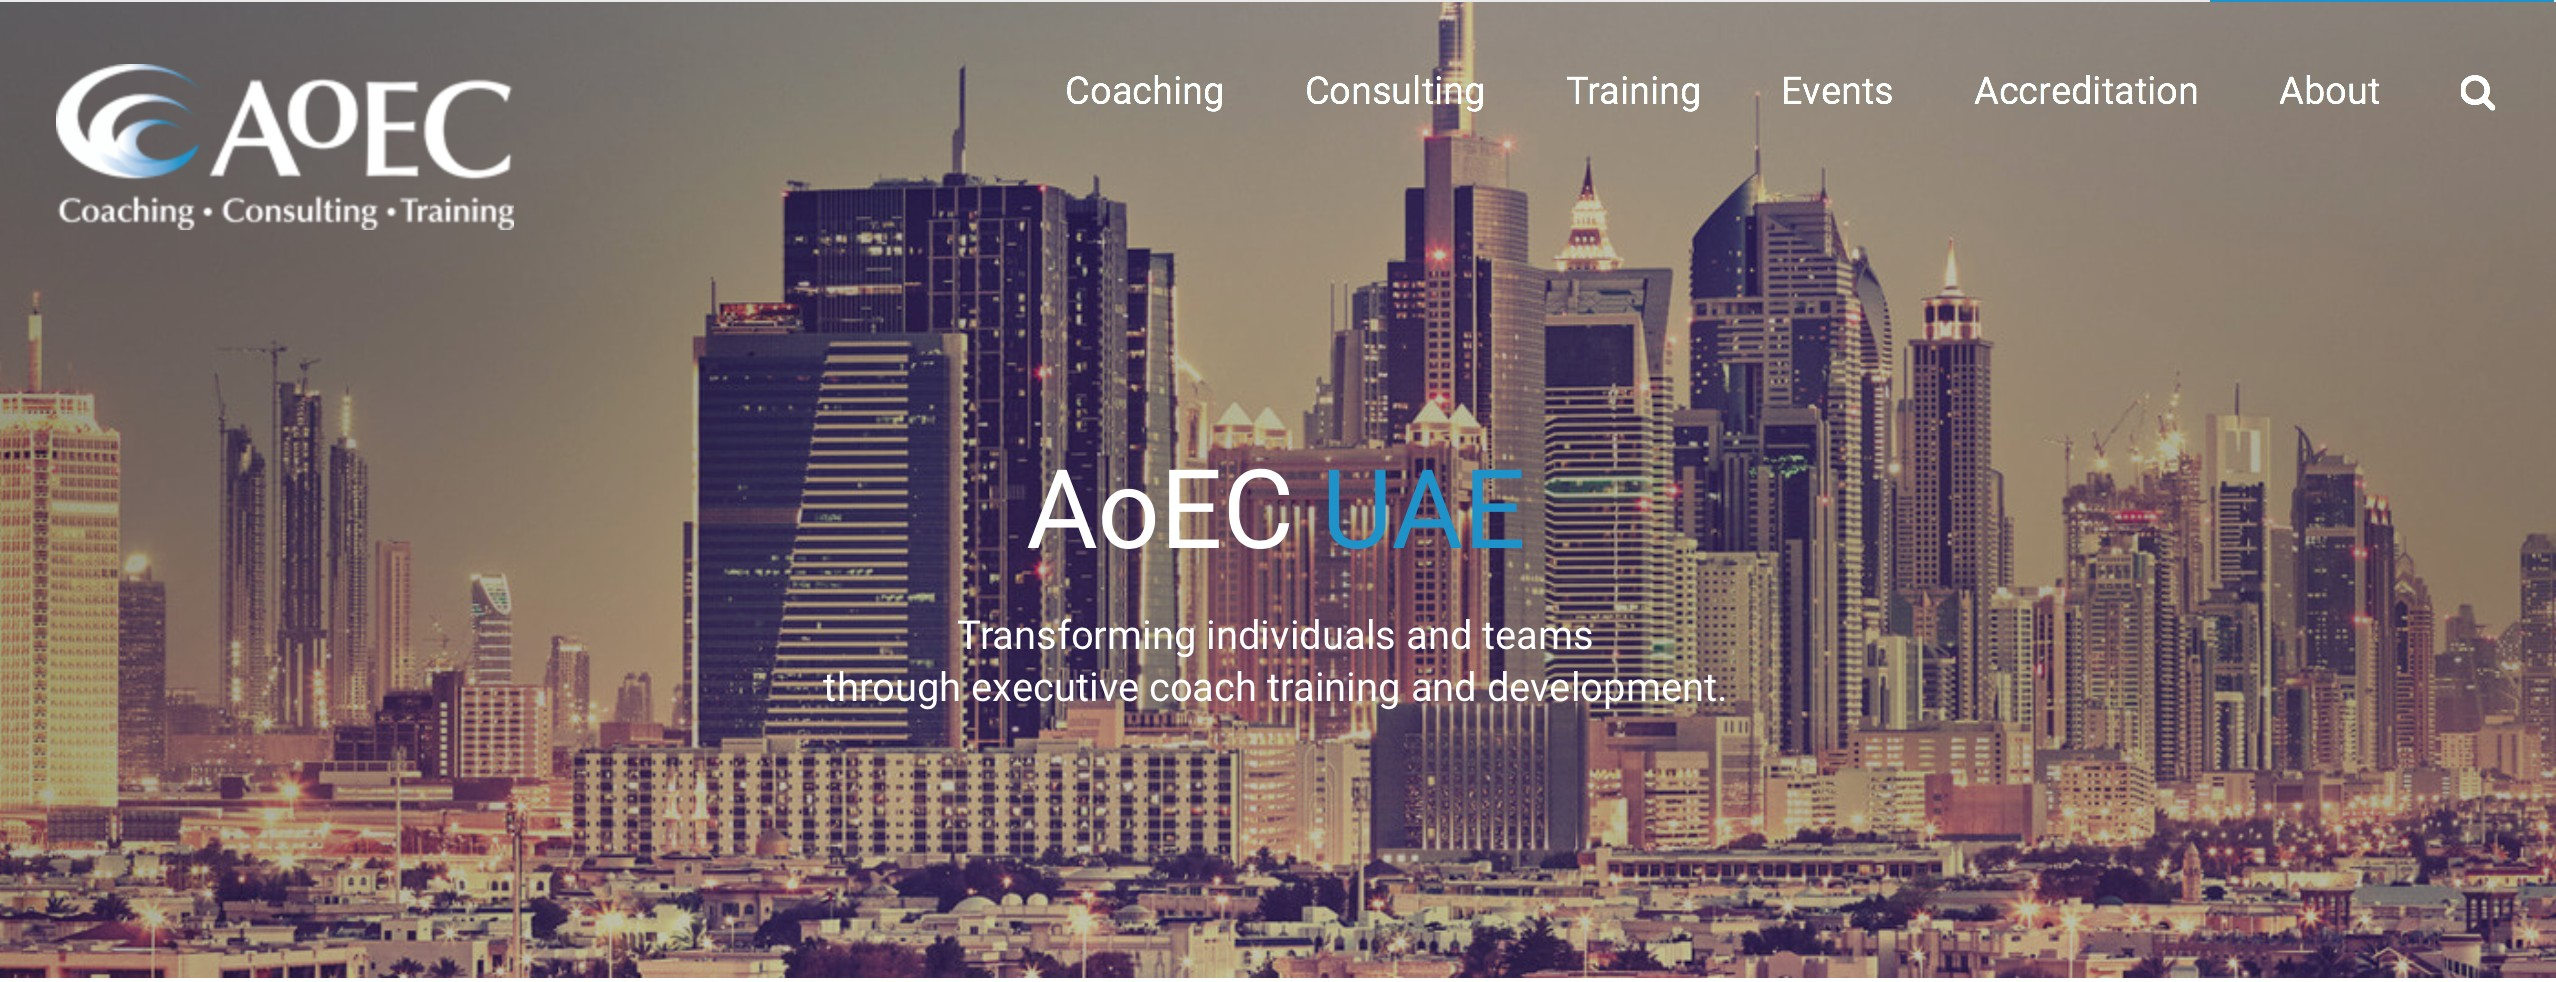 AoEC UAE: The Academy of Executive Coaching | LinkedIn